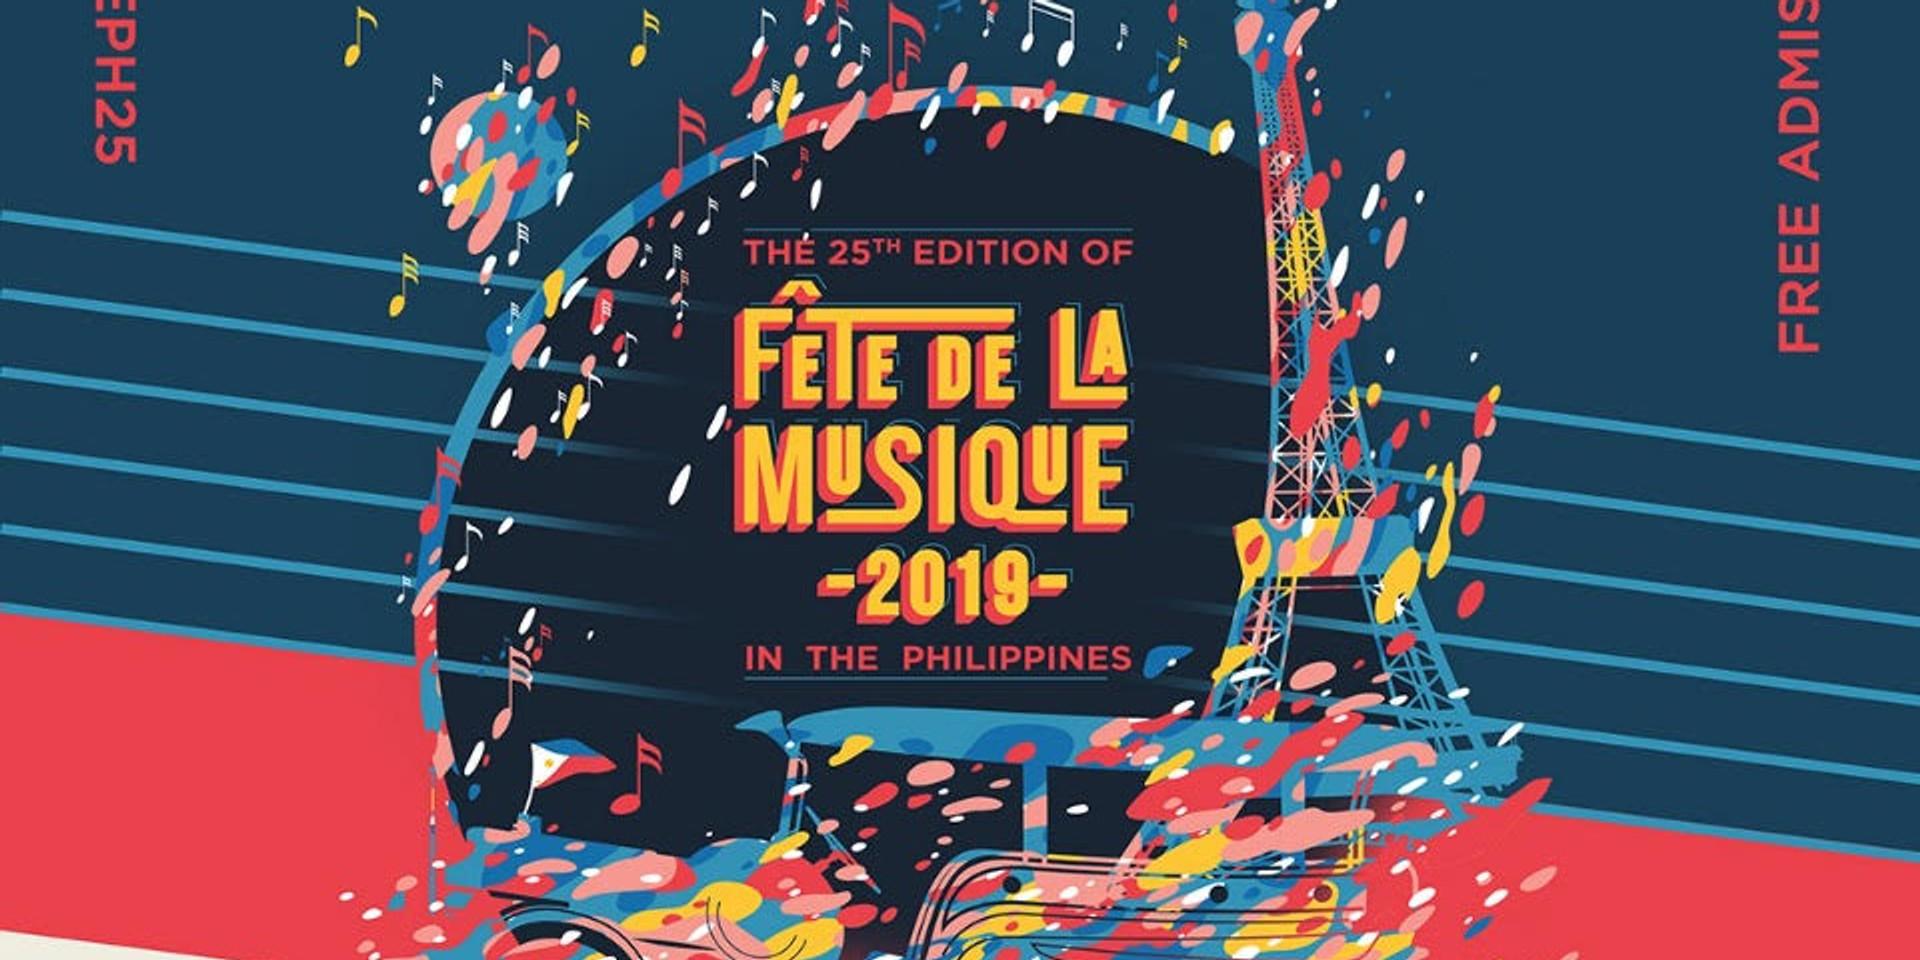 Fête de la Musique adds fourth date for its 25th anniversary